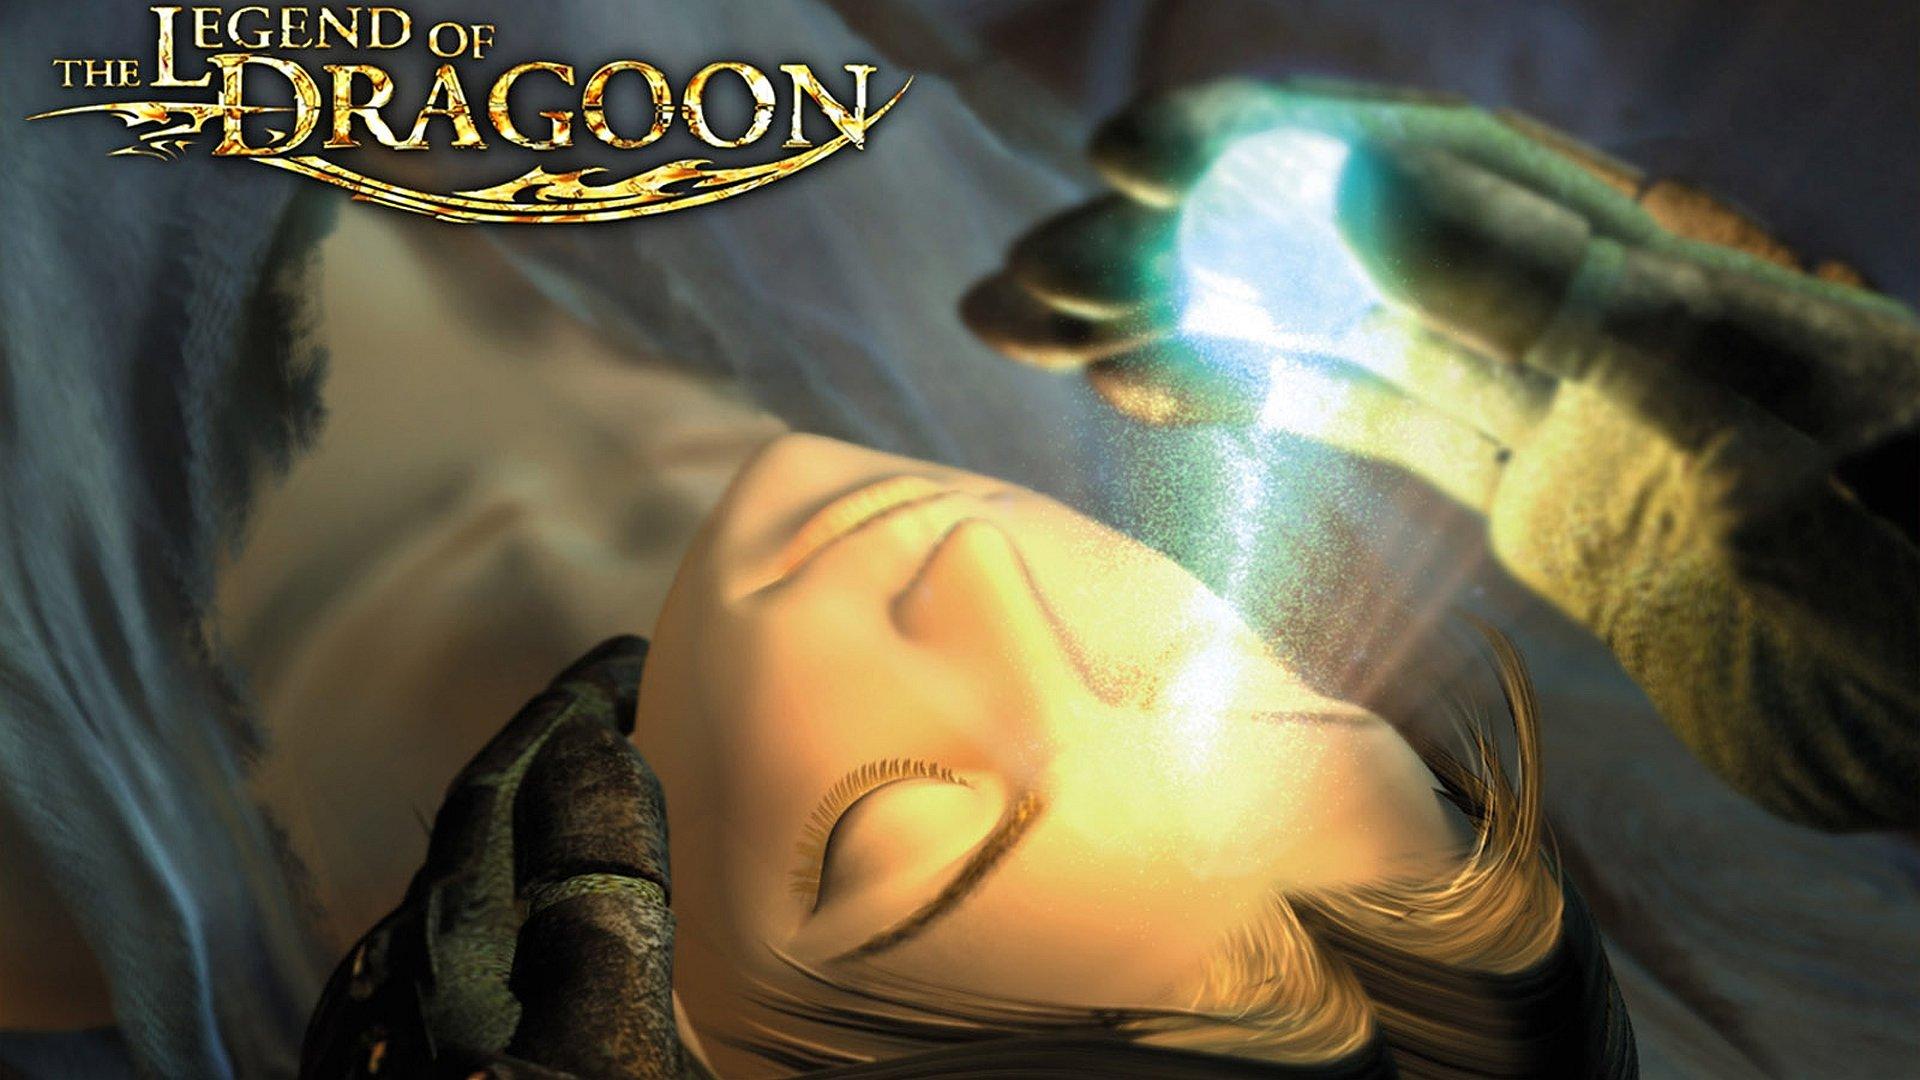 Legend Of Dragoon Wallpapers Hd For Desktop Backgrounds